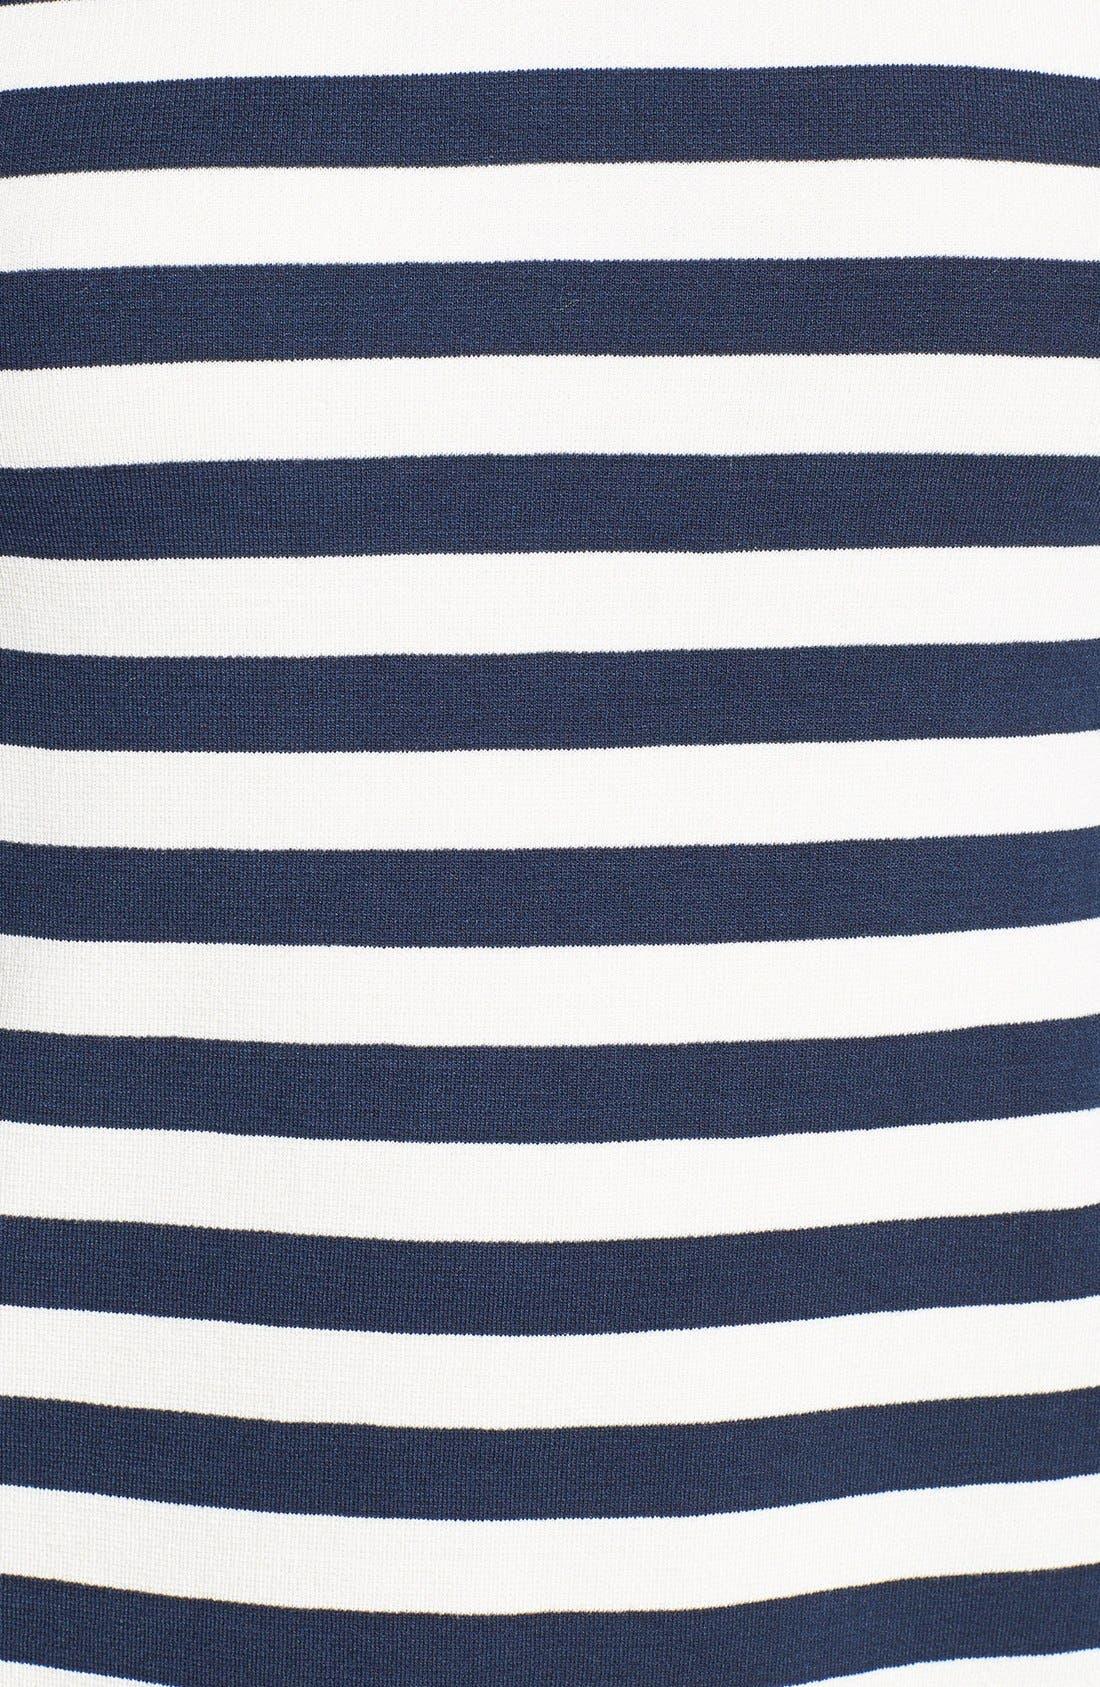 Alternate Image 3  - MARC BY MARC JACOBS 'Yuni' Stripe Tee